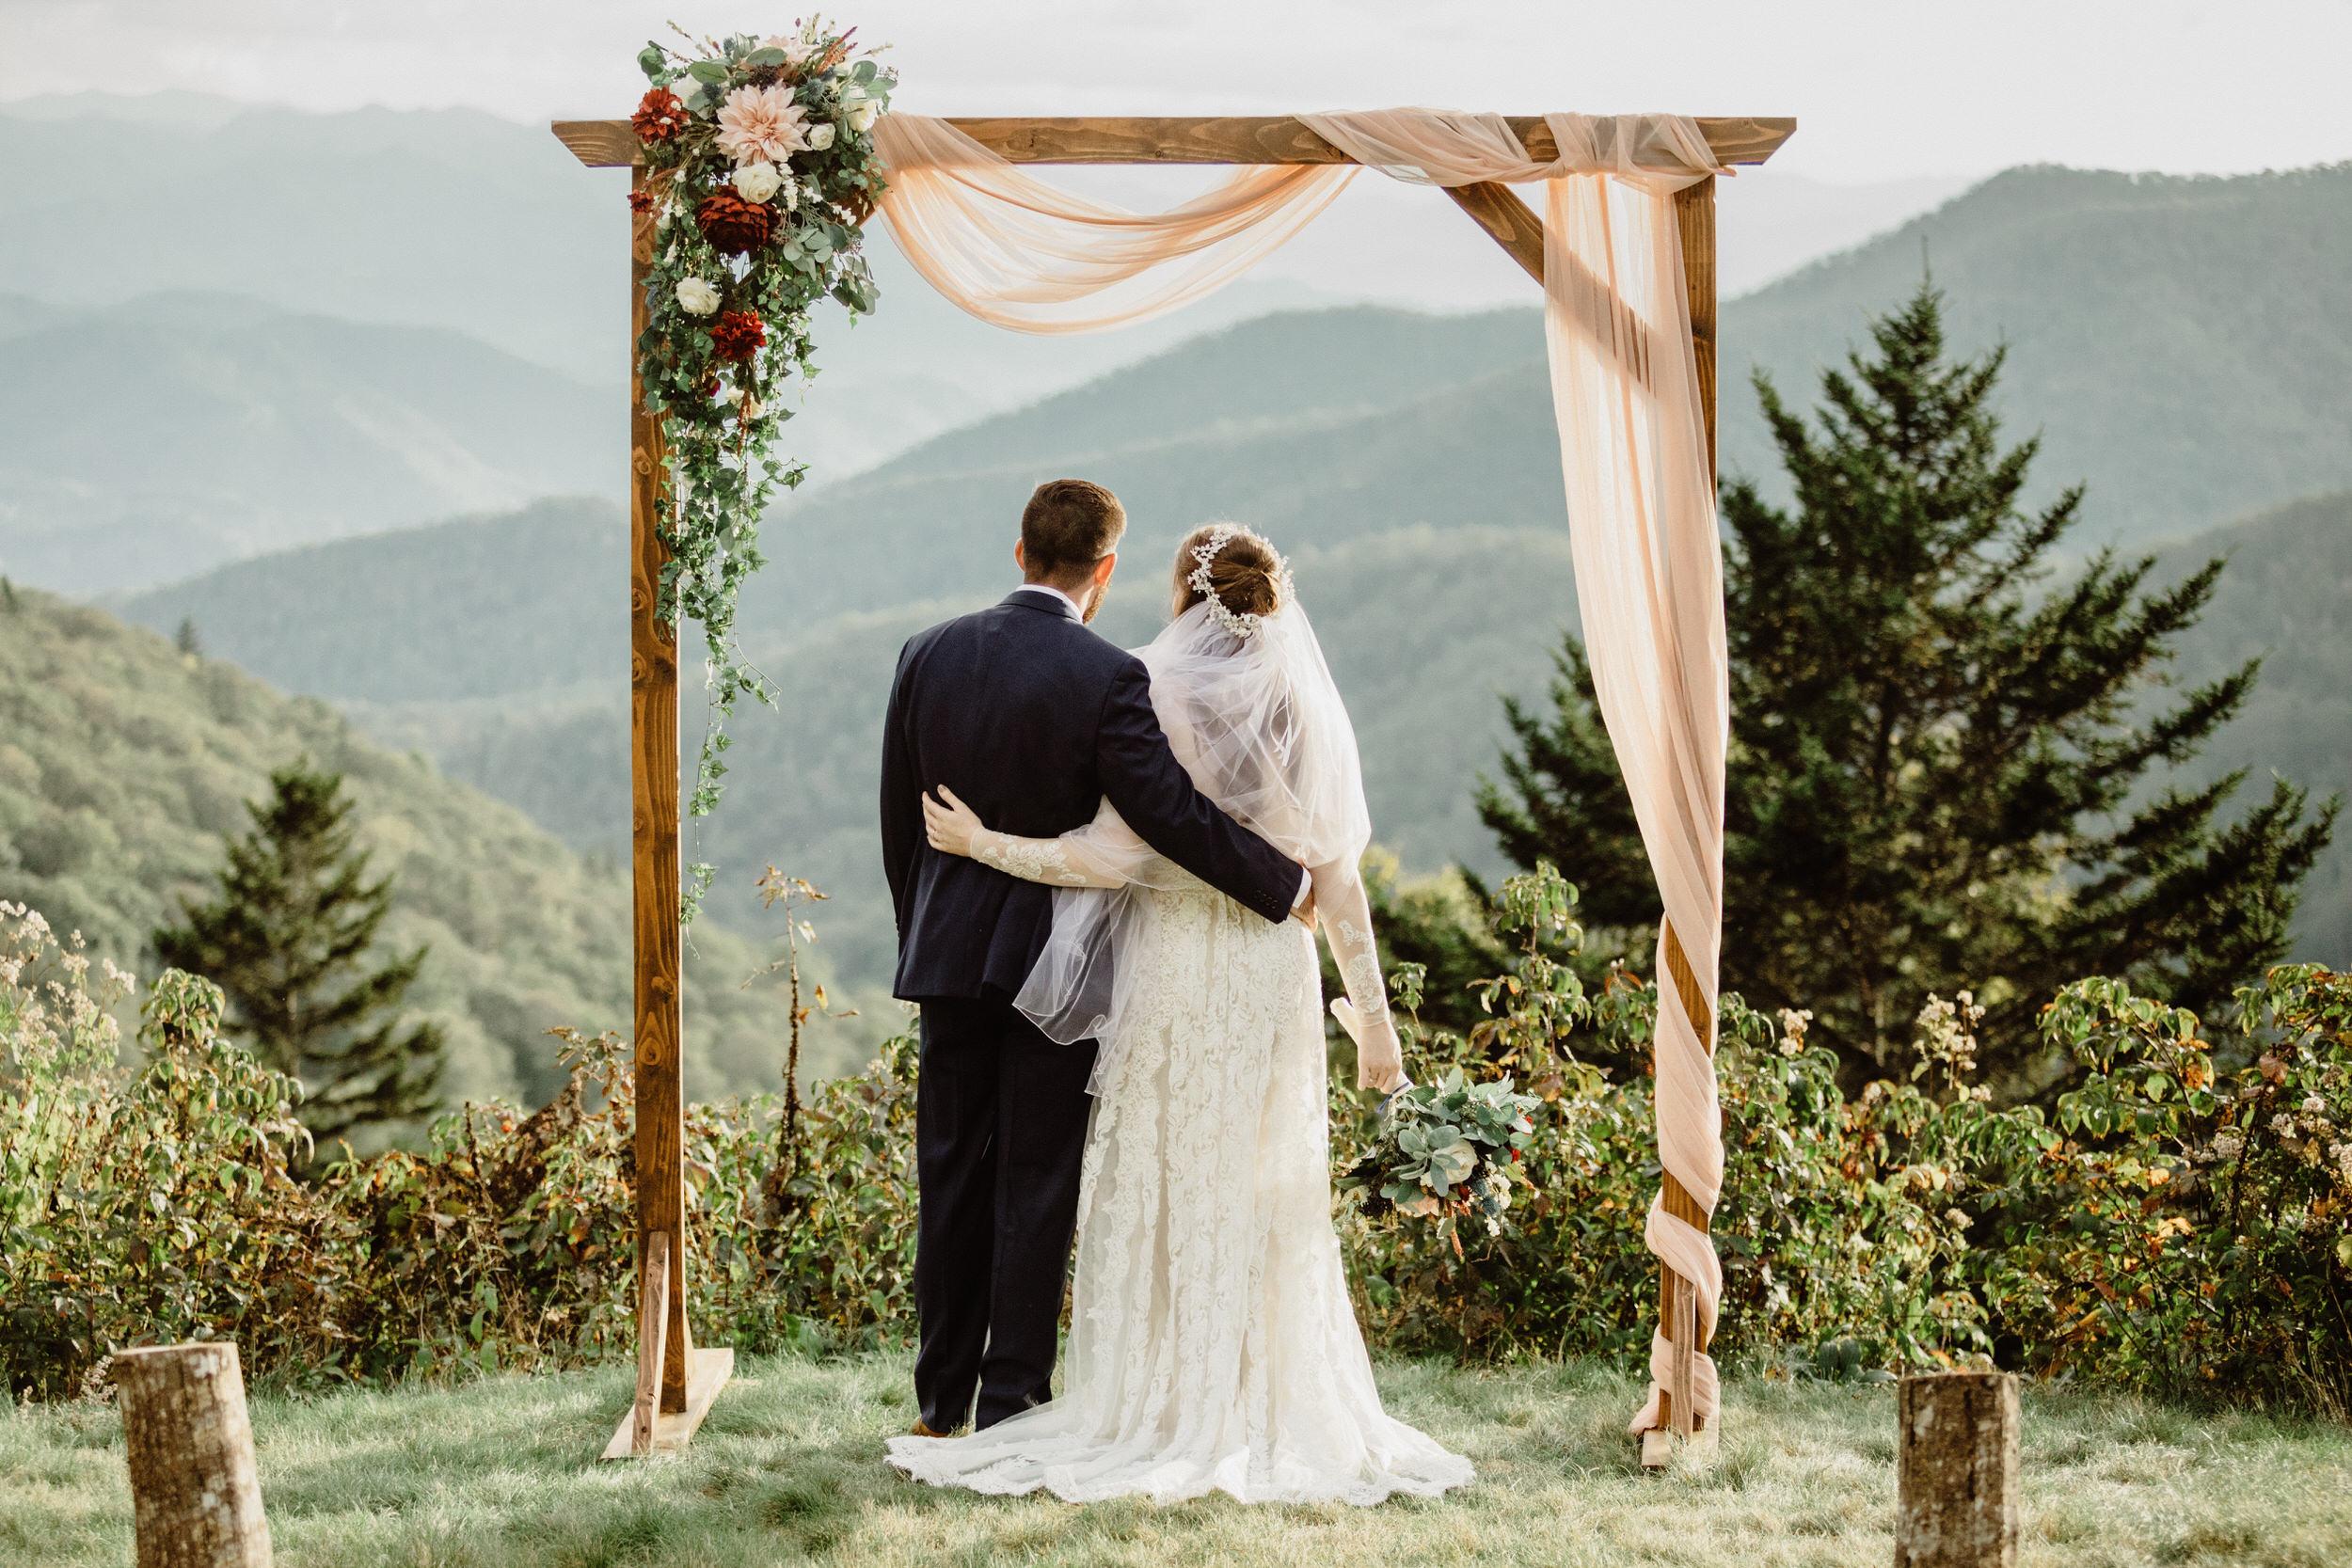 5. Mountain Bride & Groom Portraits- Cole + Rachel's Great Smoky Mountain National Park Elopement-26.jpg